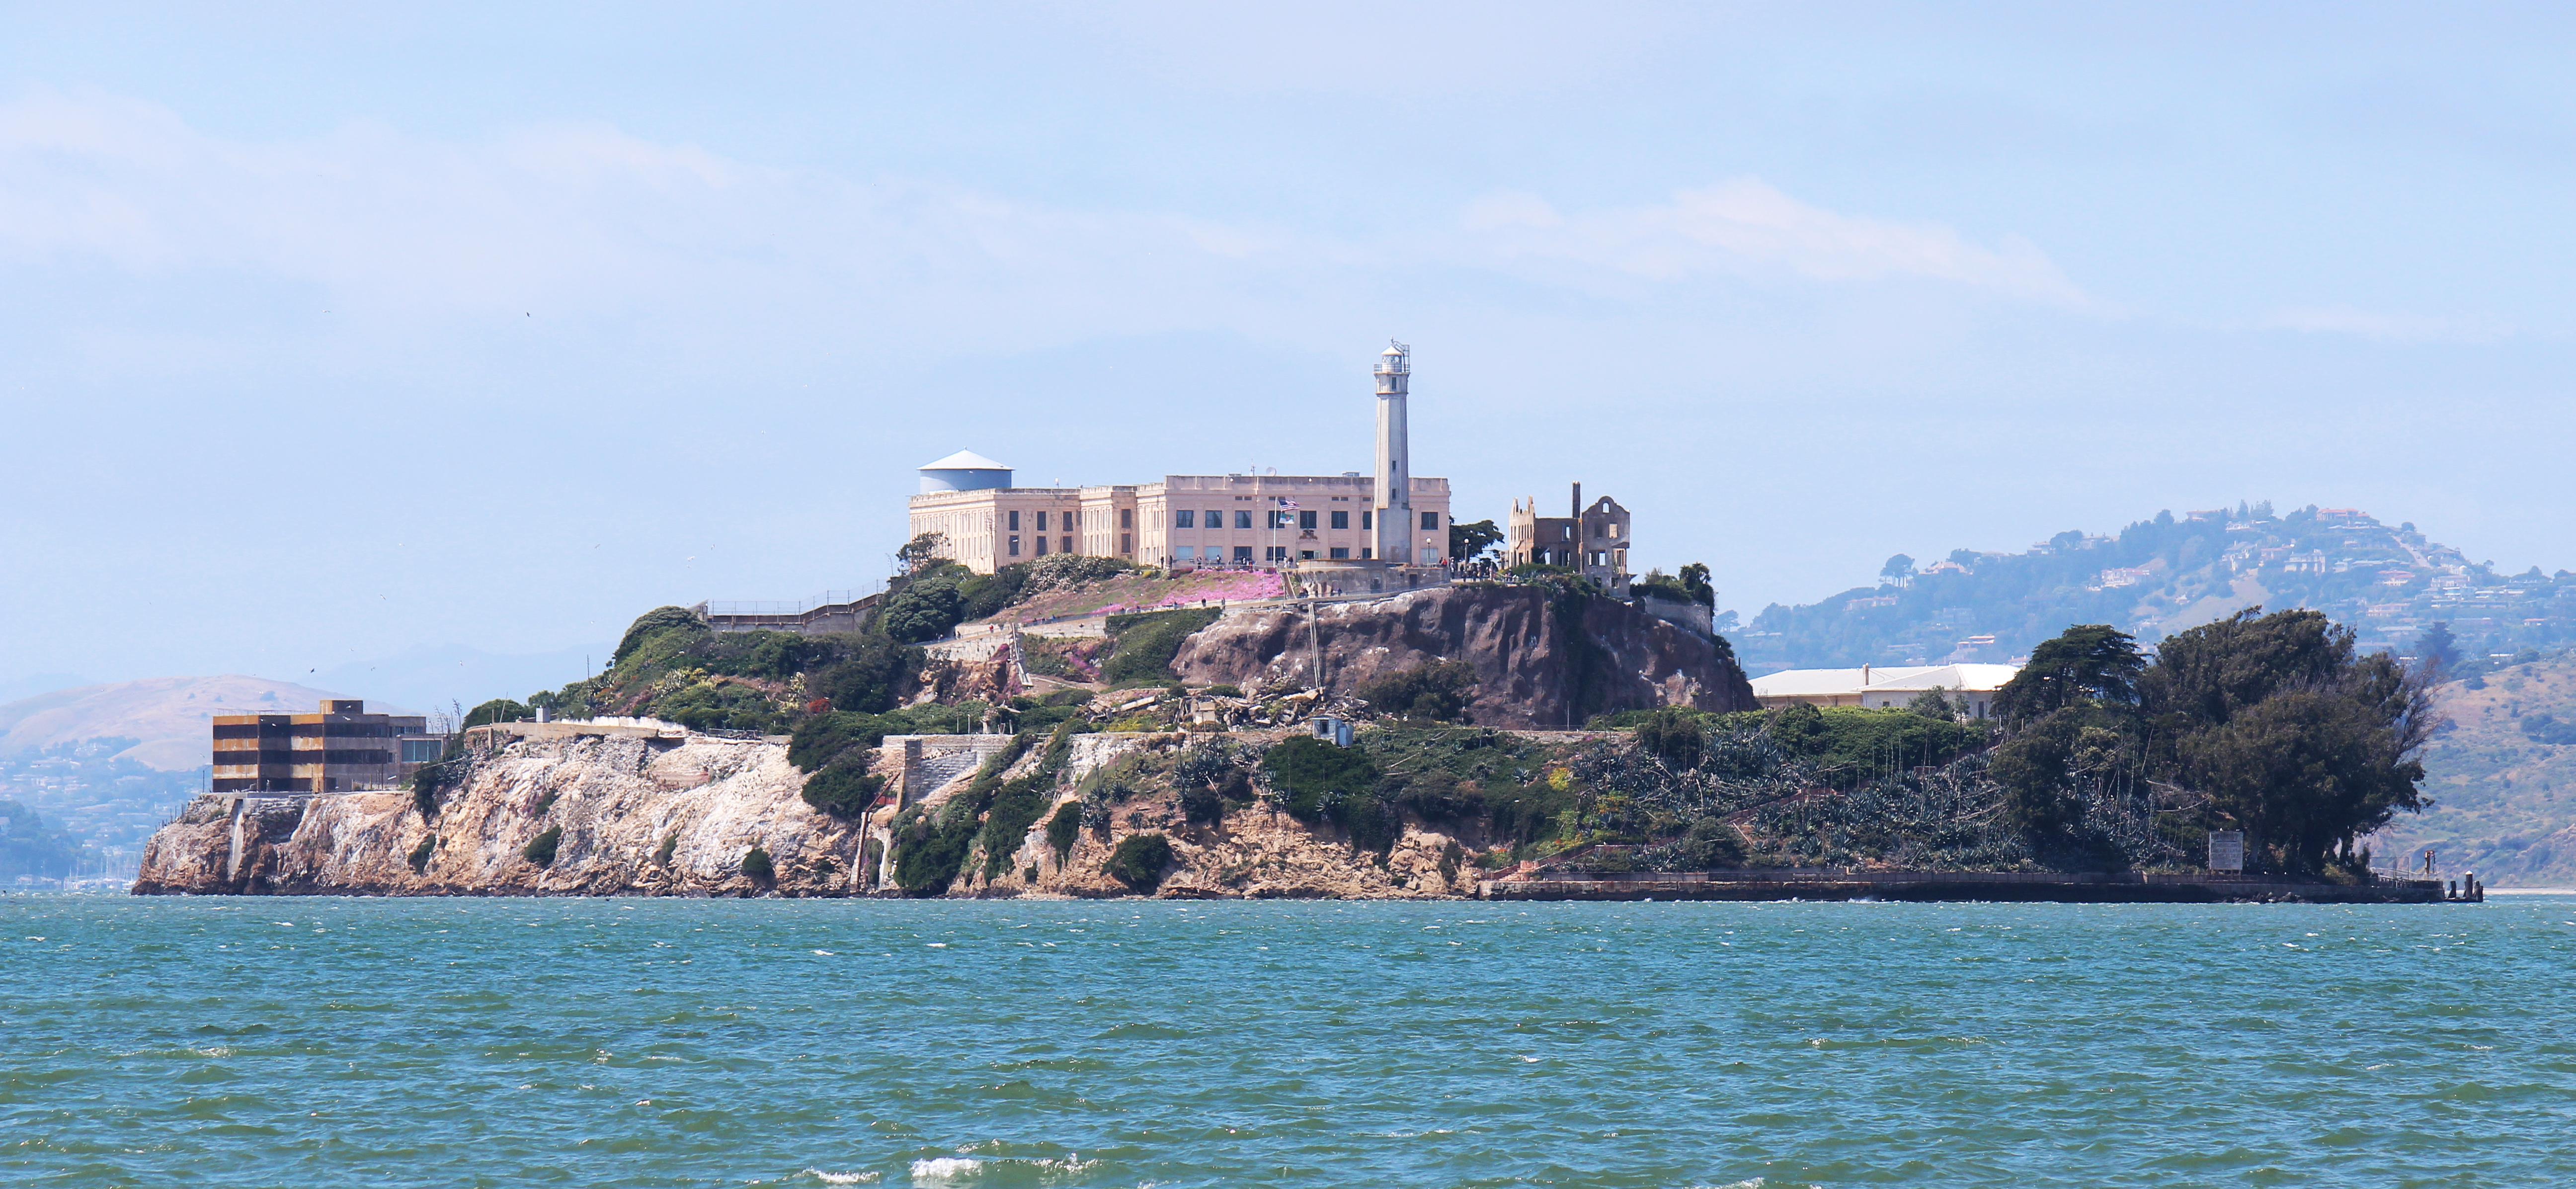 Alcatraz Island, The Rock, San Francisco, California